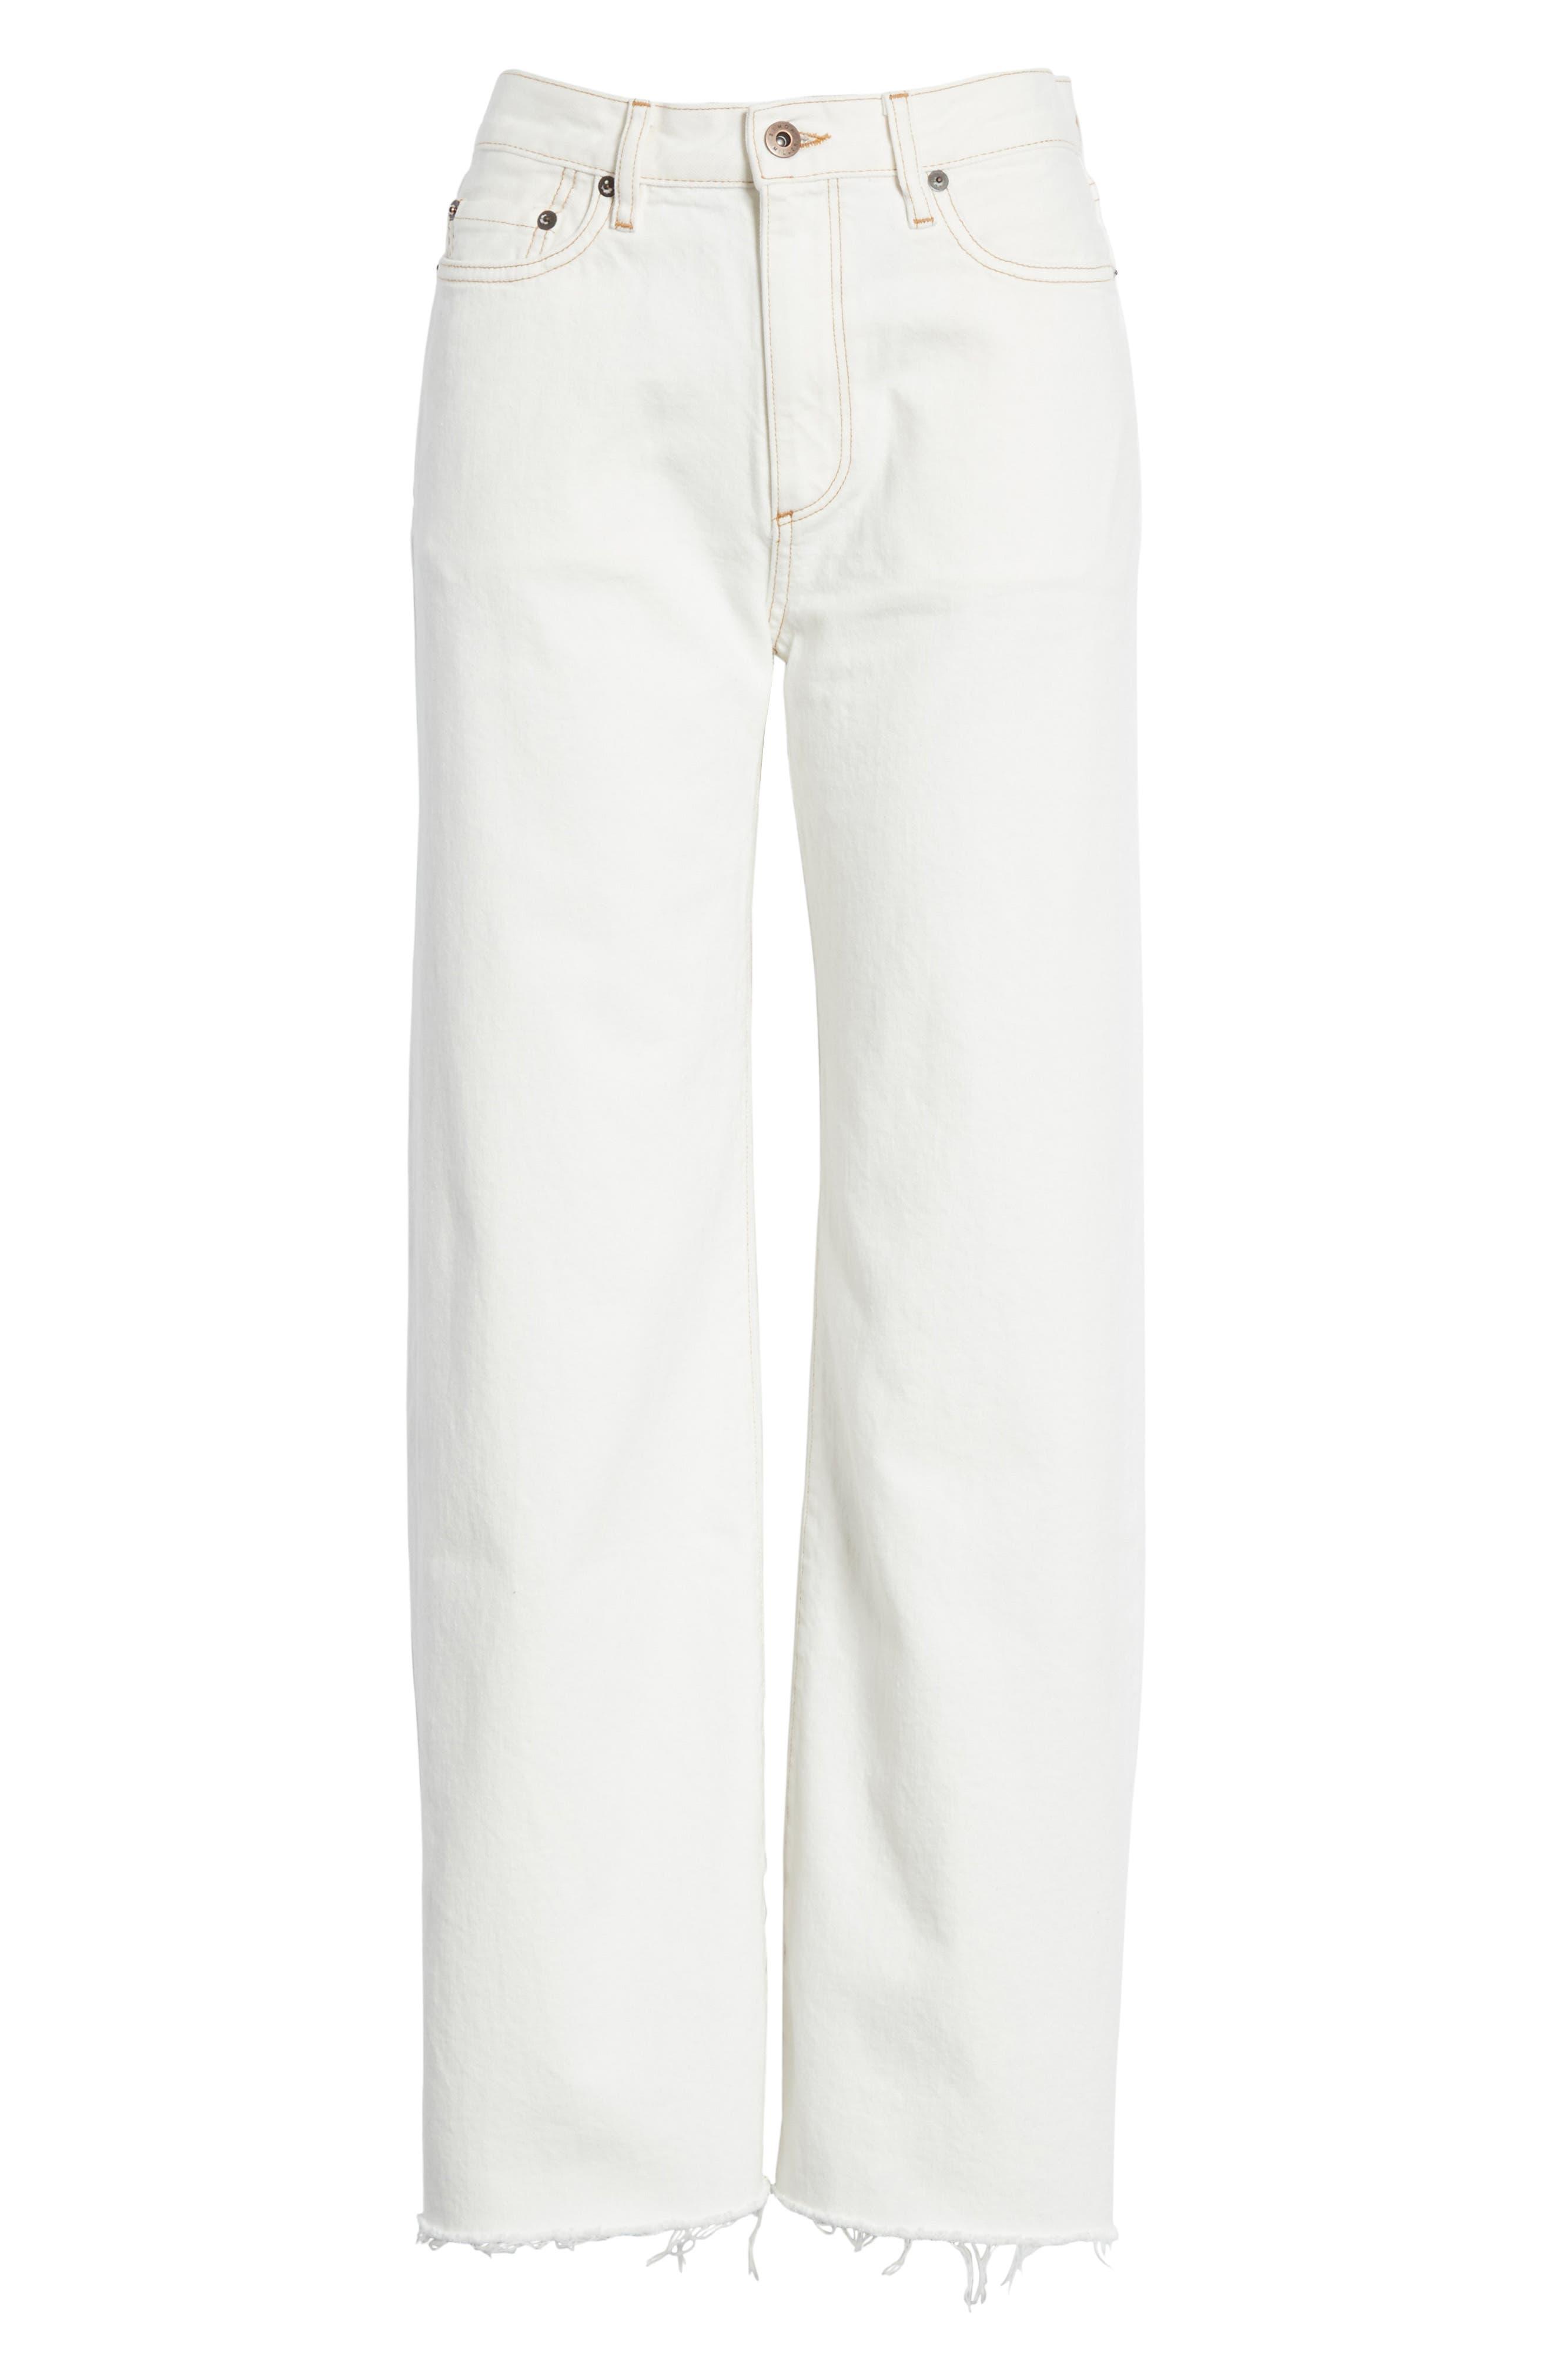 Enid High Waist Wide Leg Jeans,                             Alternate thumbnail 6, color,                             100